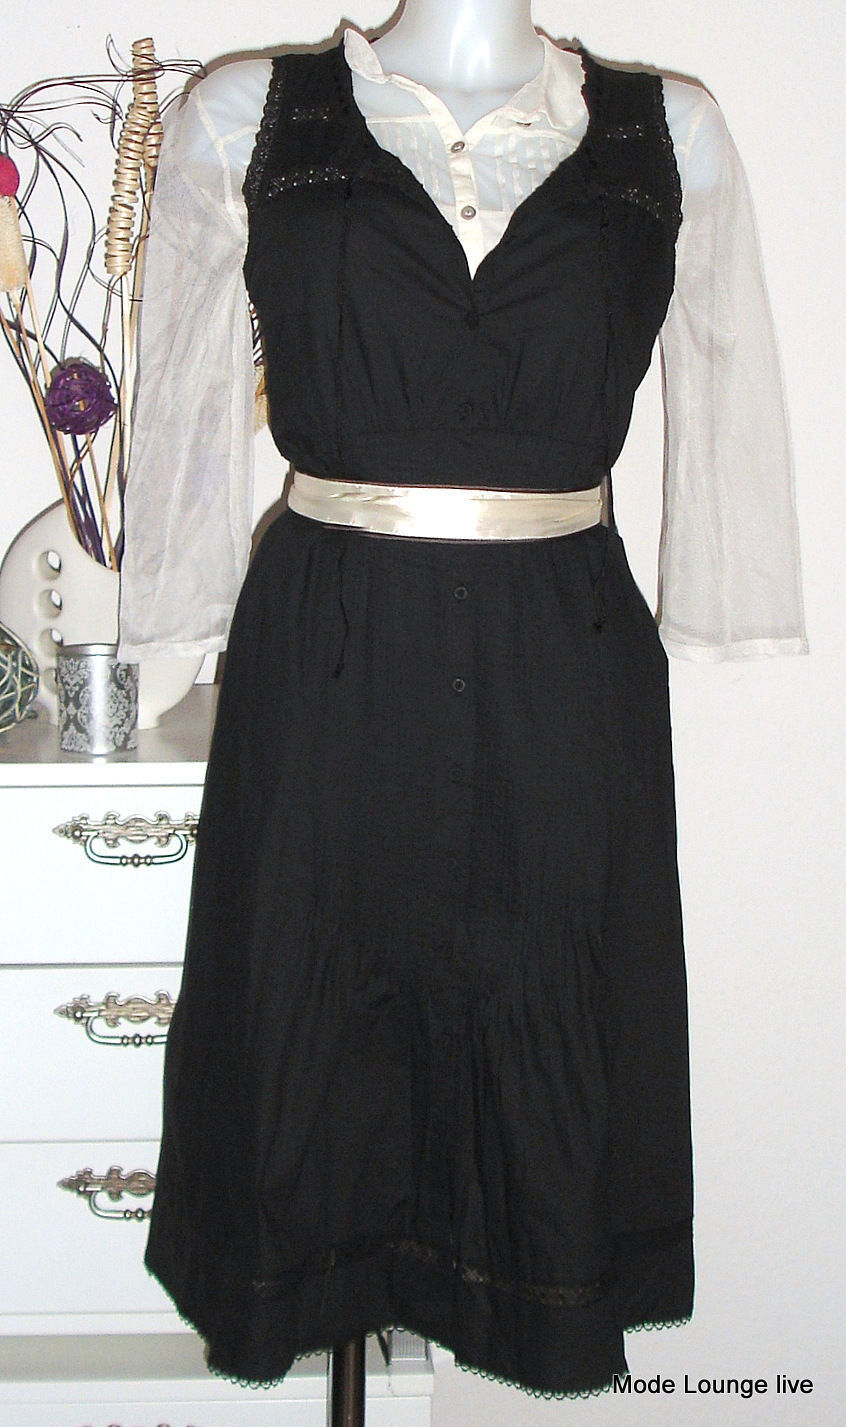 Noa Noa robe black Robe River cottonblack black Coton BASIC